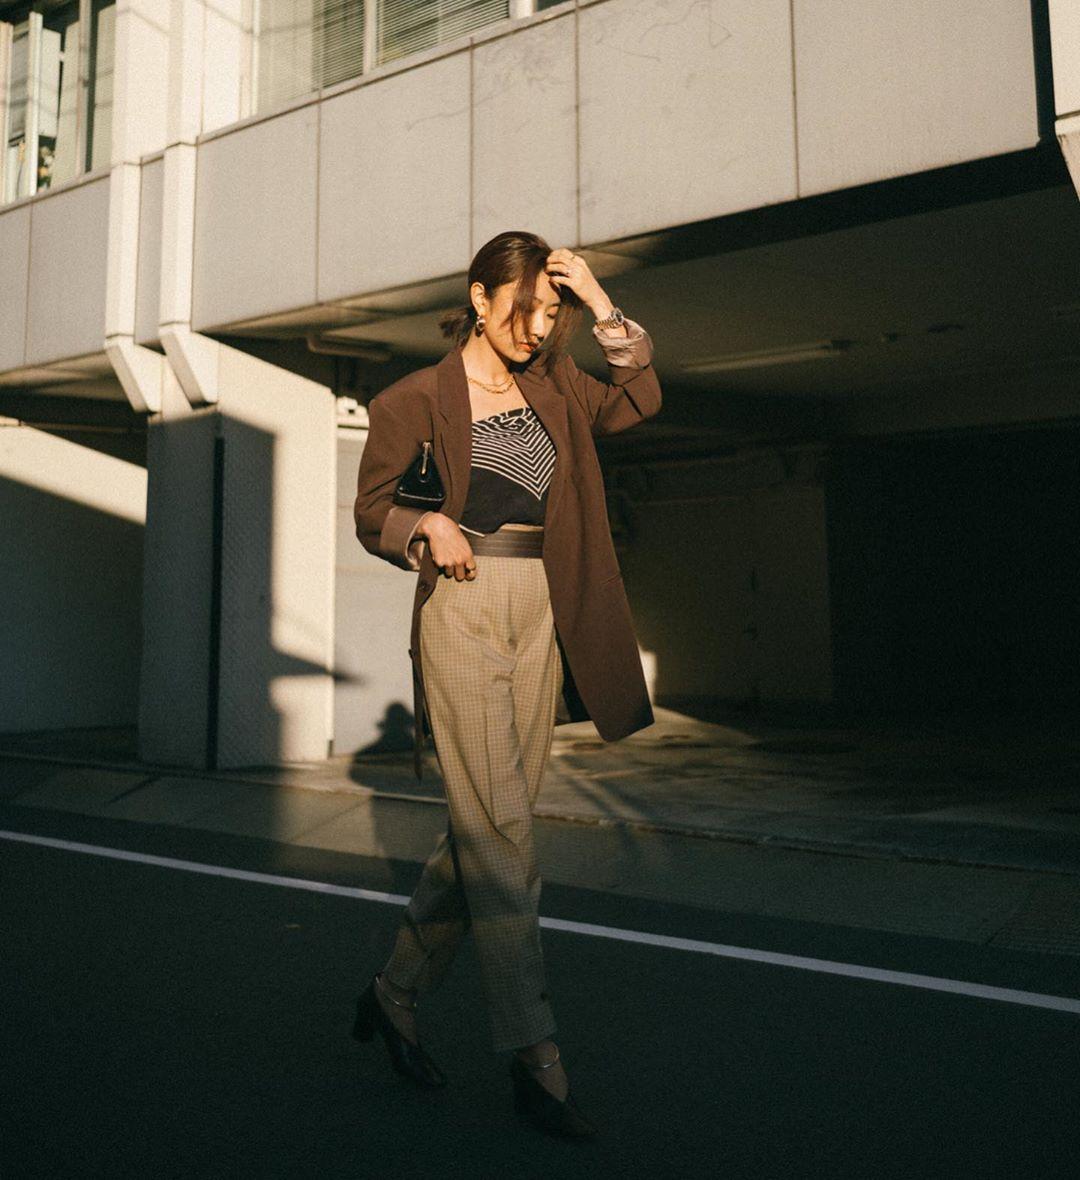 savislook mặc quần caro với áo bandana và blazer